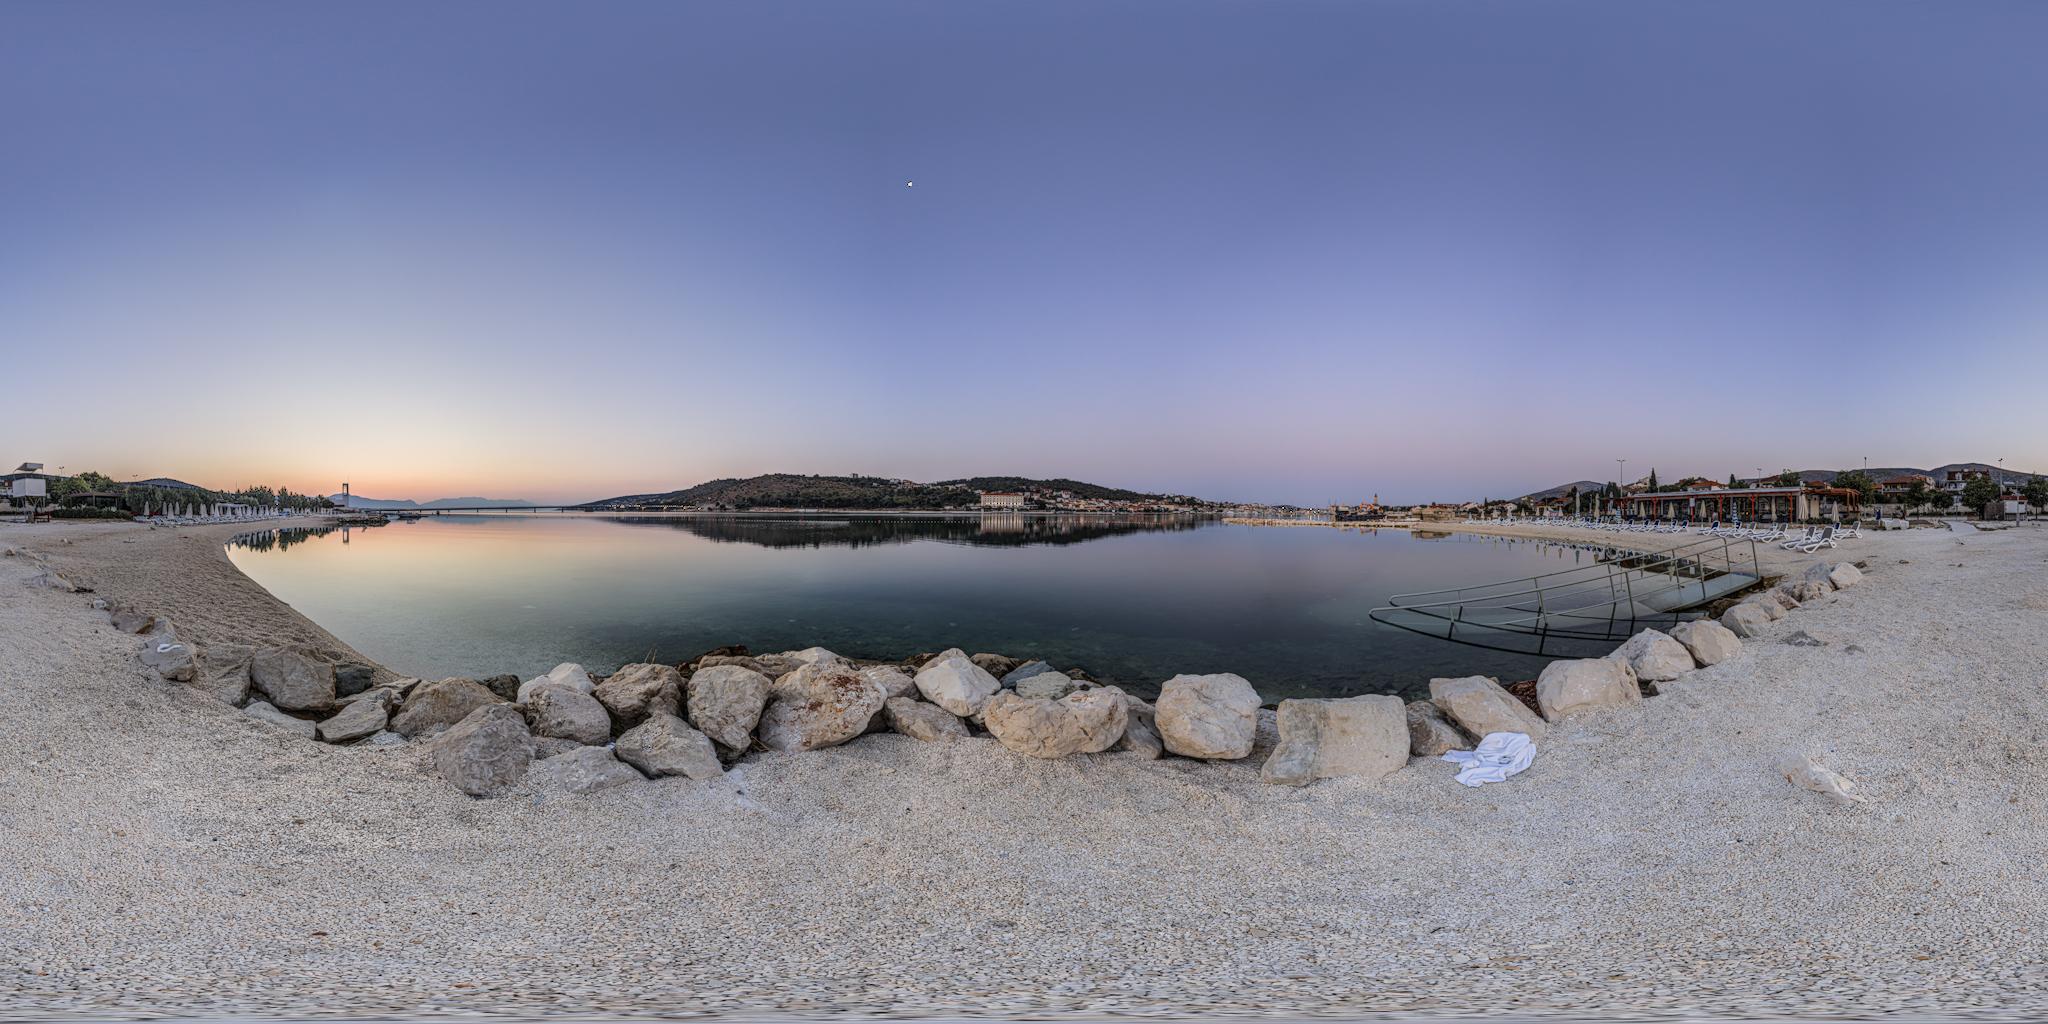 HDRI-Skies-Coffee-Bar-Baketina-Trogir